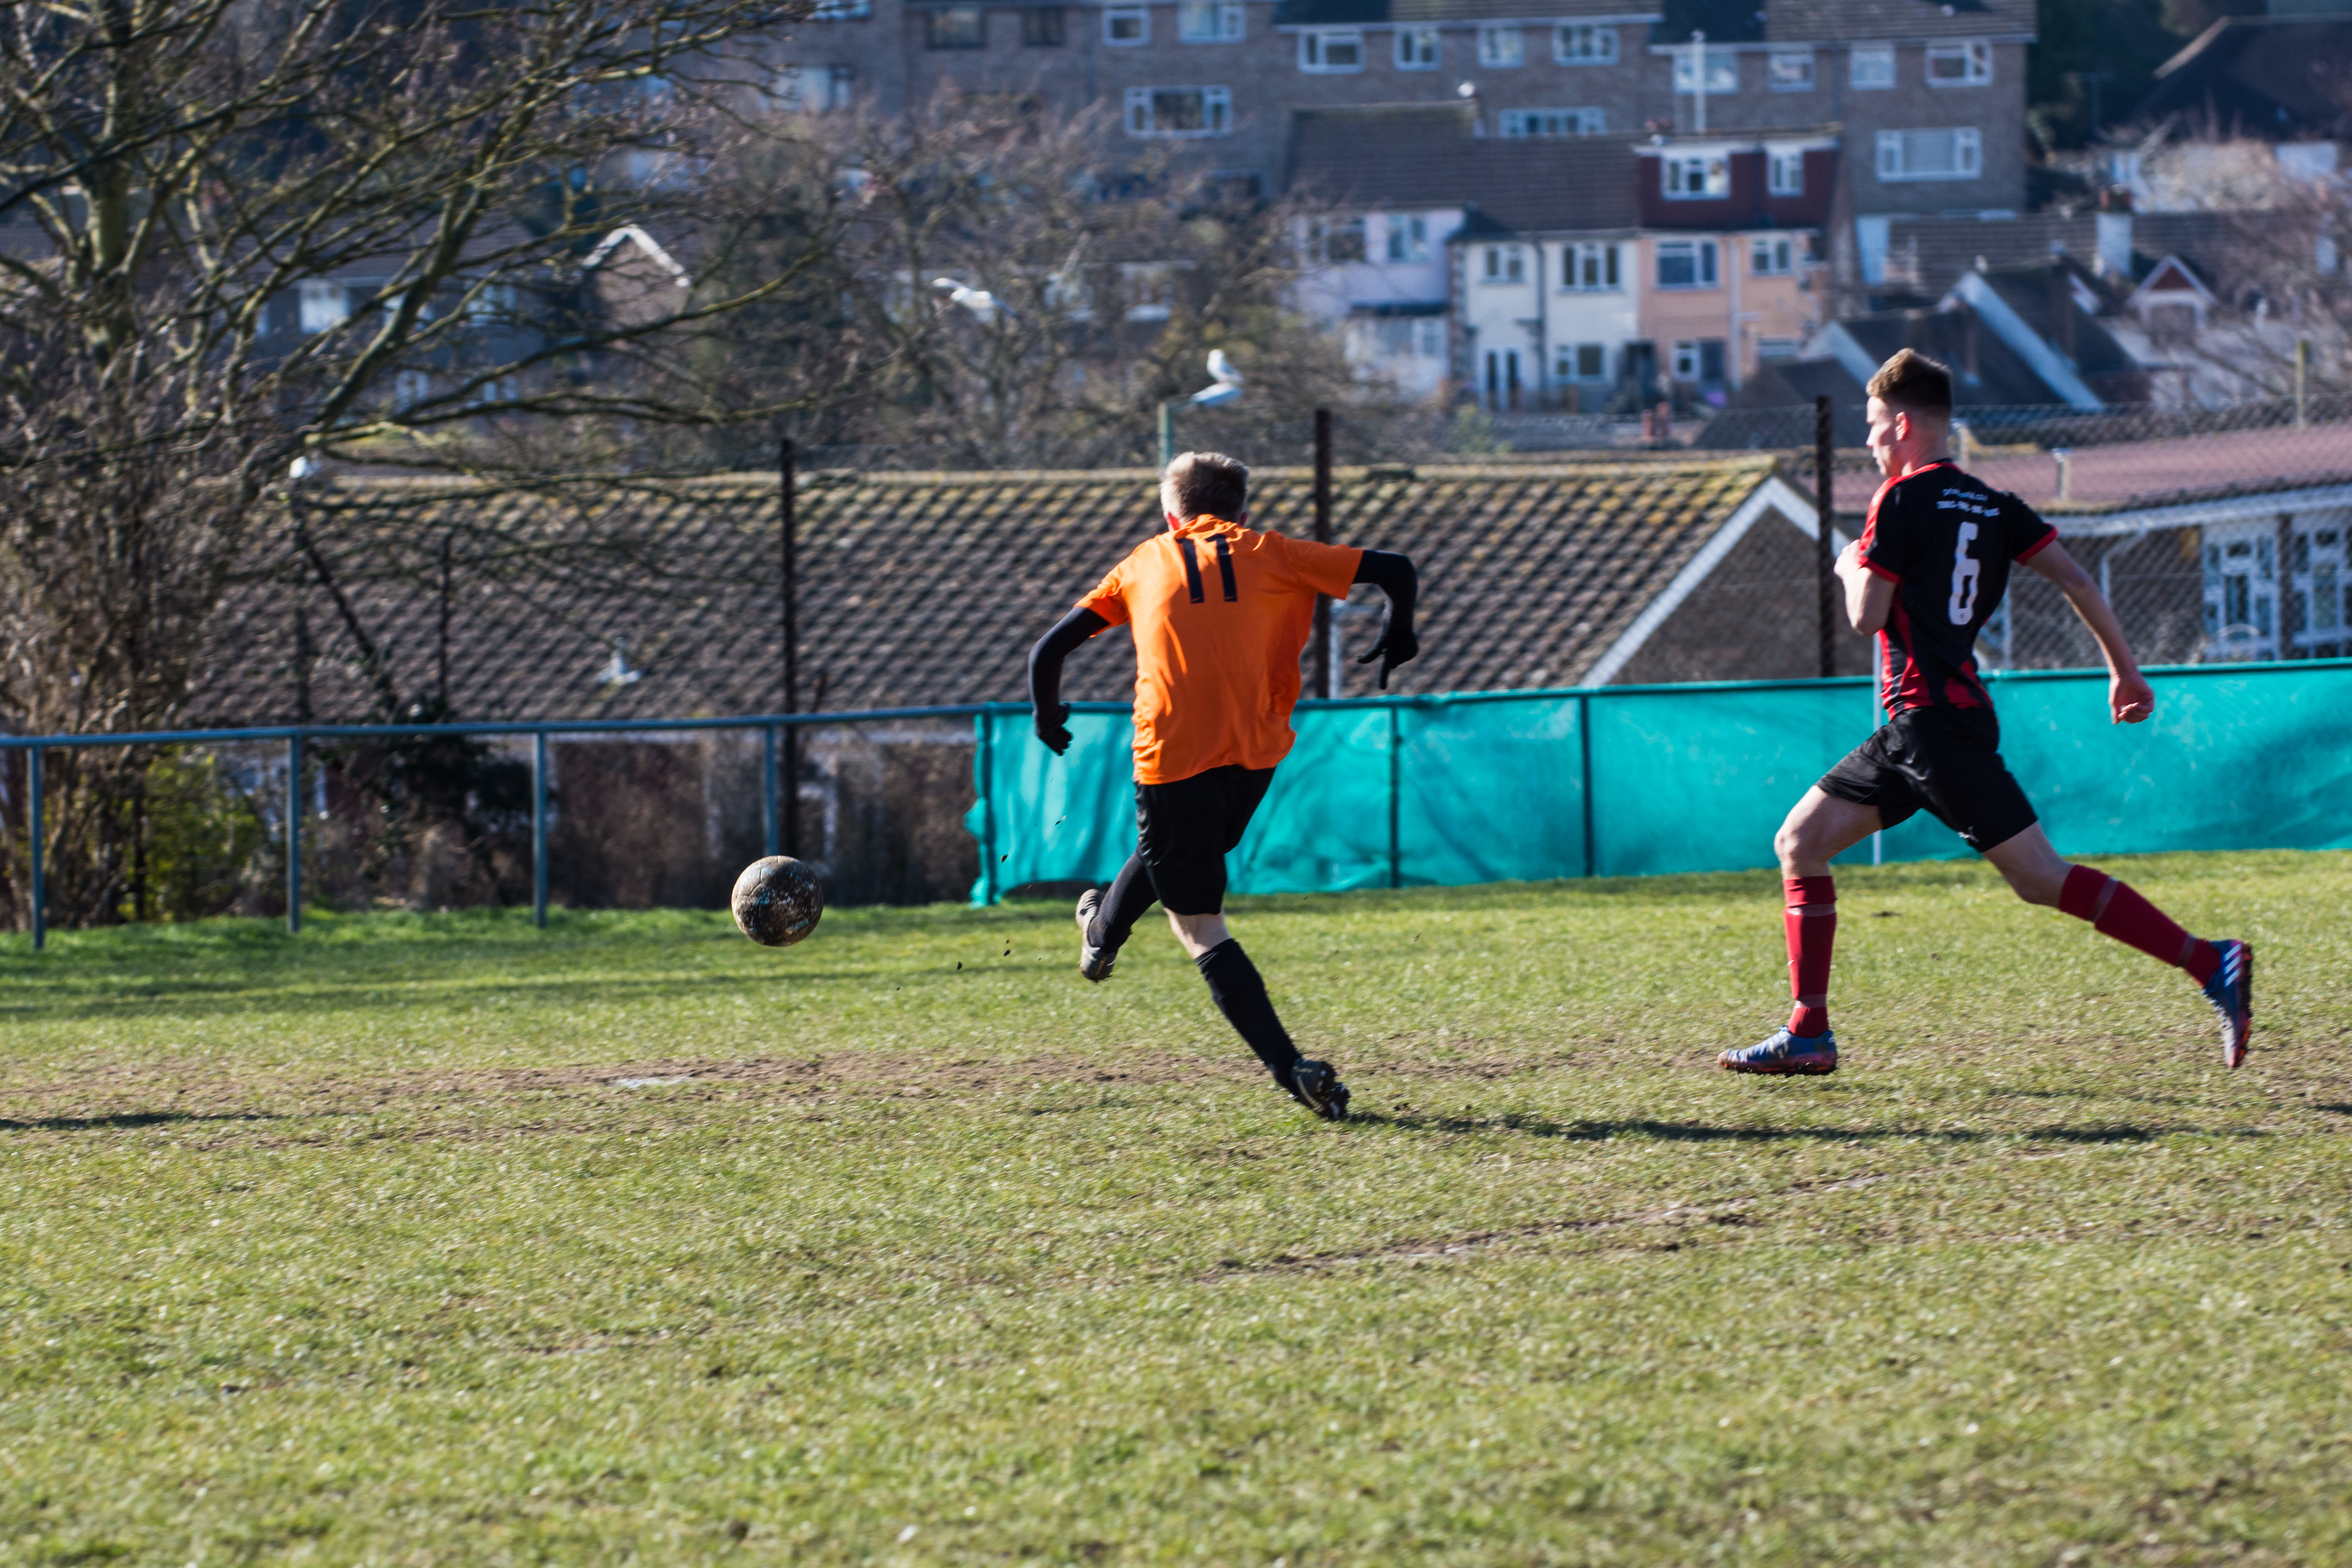 Mile Oak FC U18s vs Southwick FC U18s 25.02.18 11 DAVID_JEFFERY